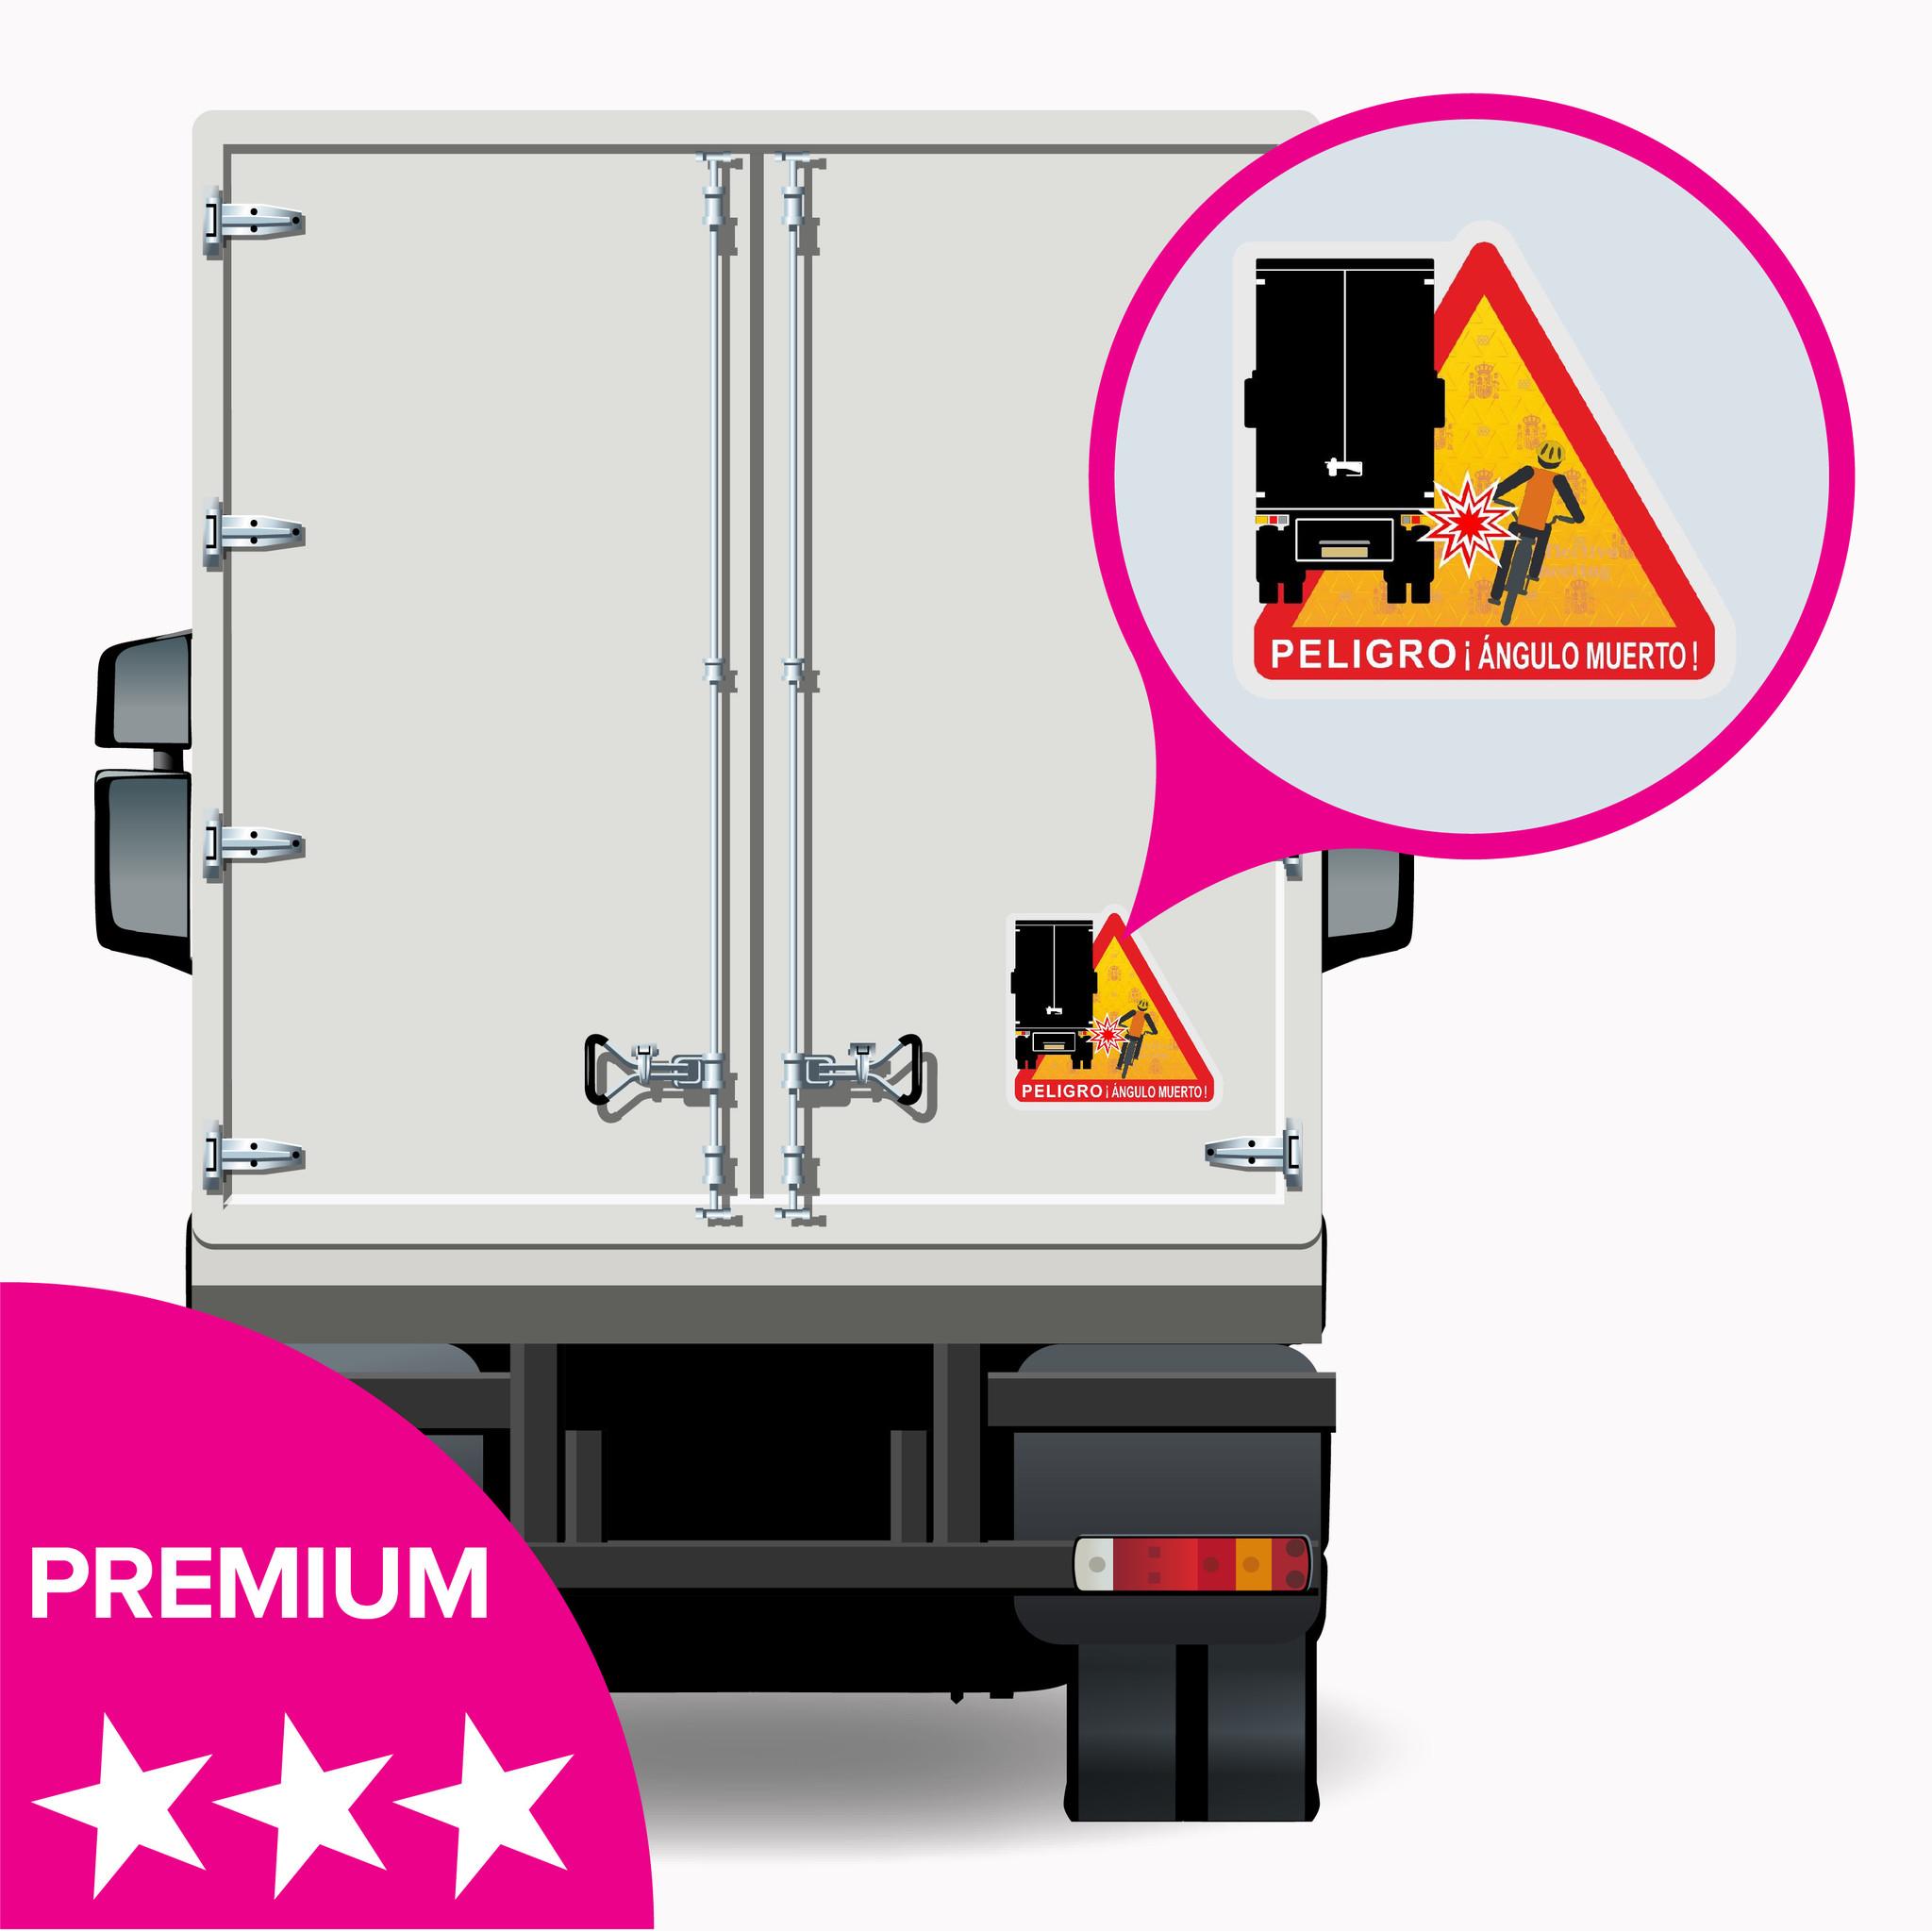 Angle mort - Autocollant Peligro ángulos muertos Truck Spain - PREMIUM